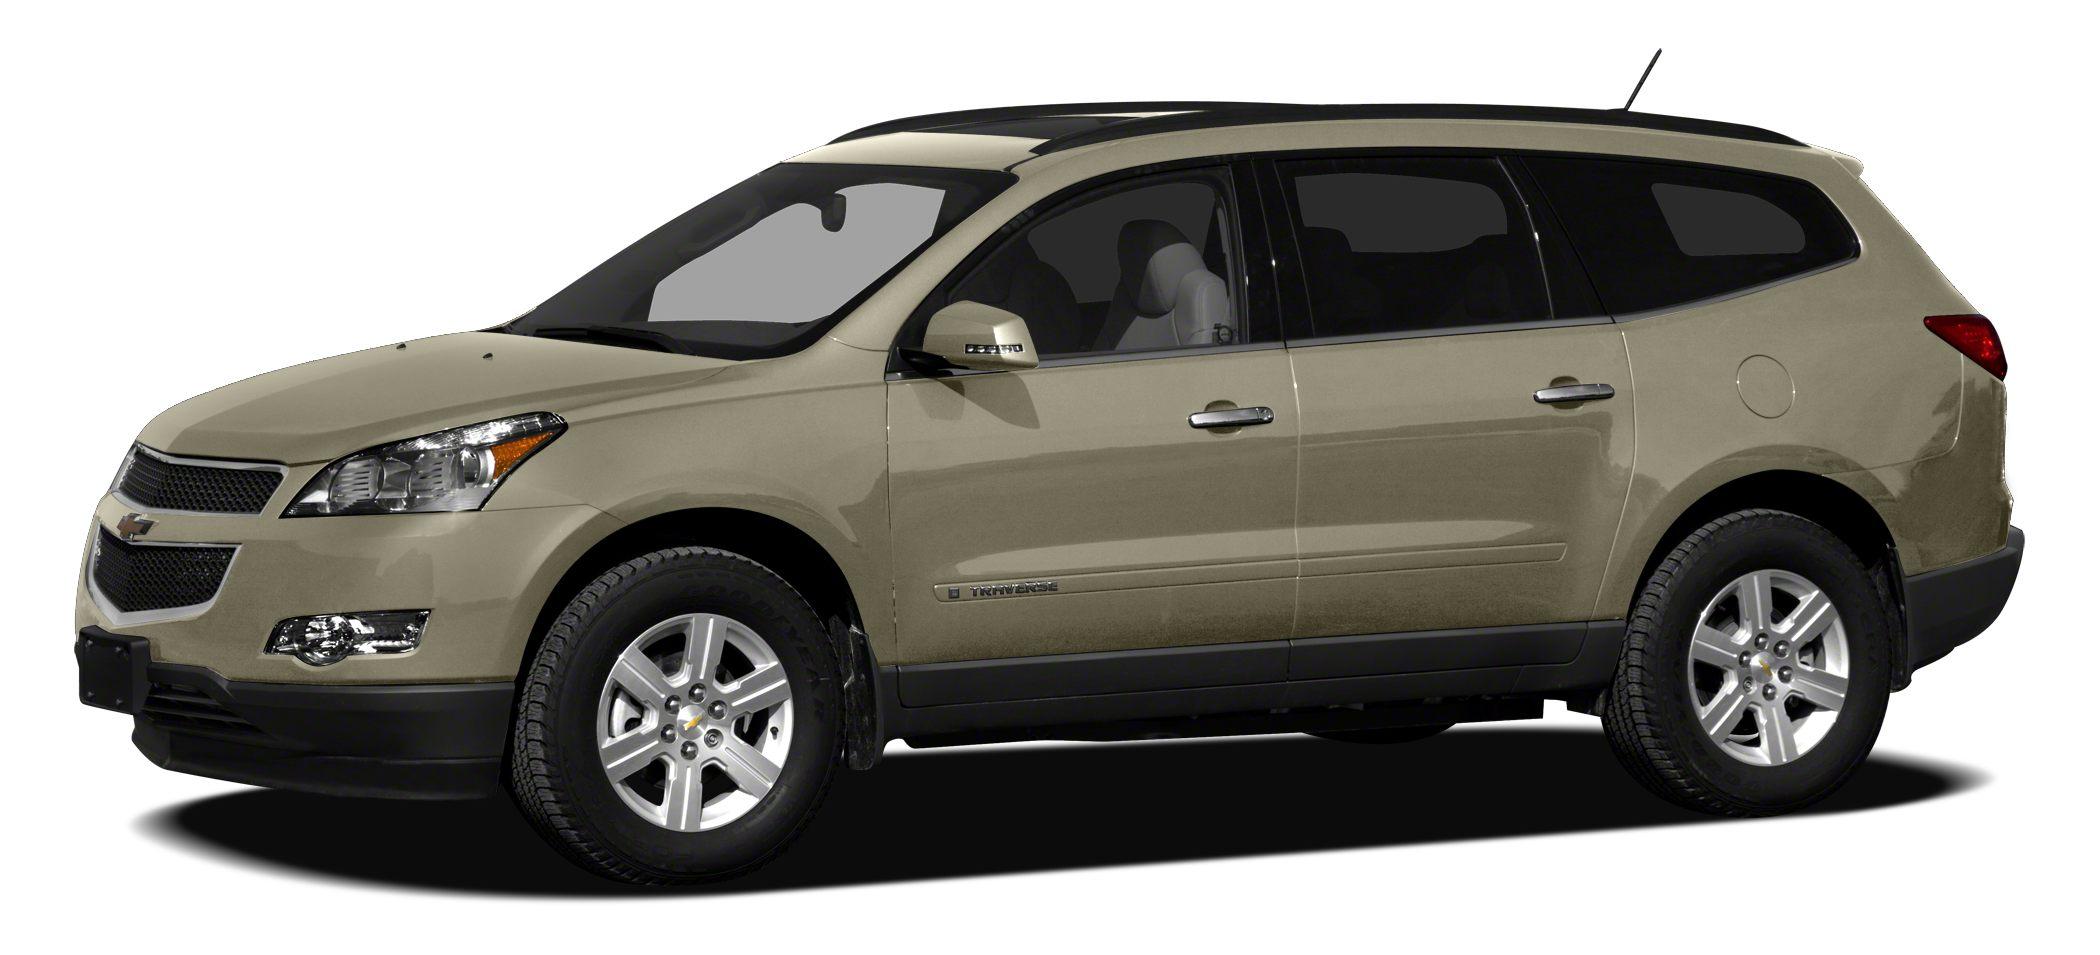 2012 Chevrolet Traverse 1LT Preferred Equipment Group 1LT 8-Way Power Driver Seat wPower Lumbar